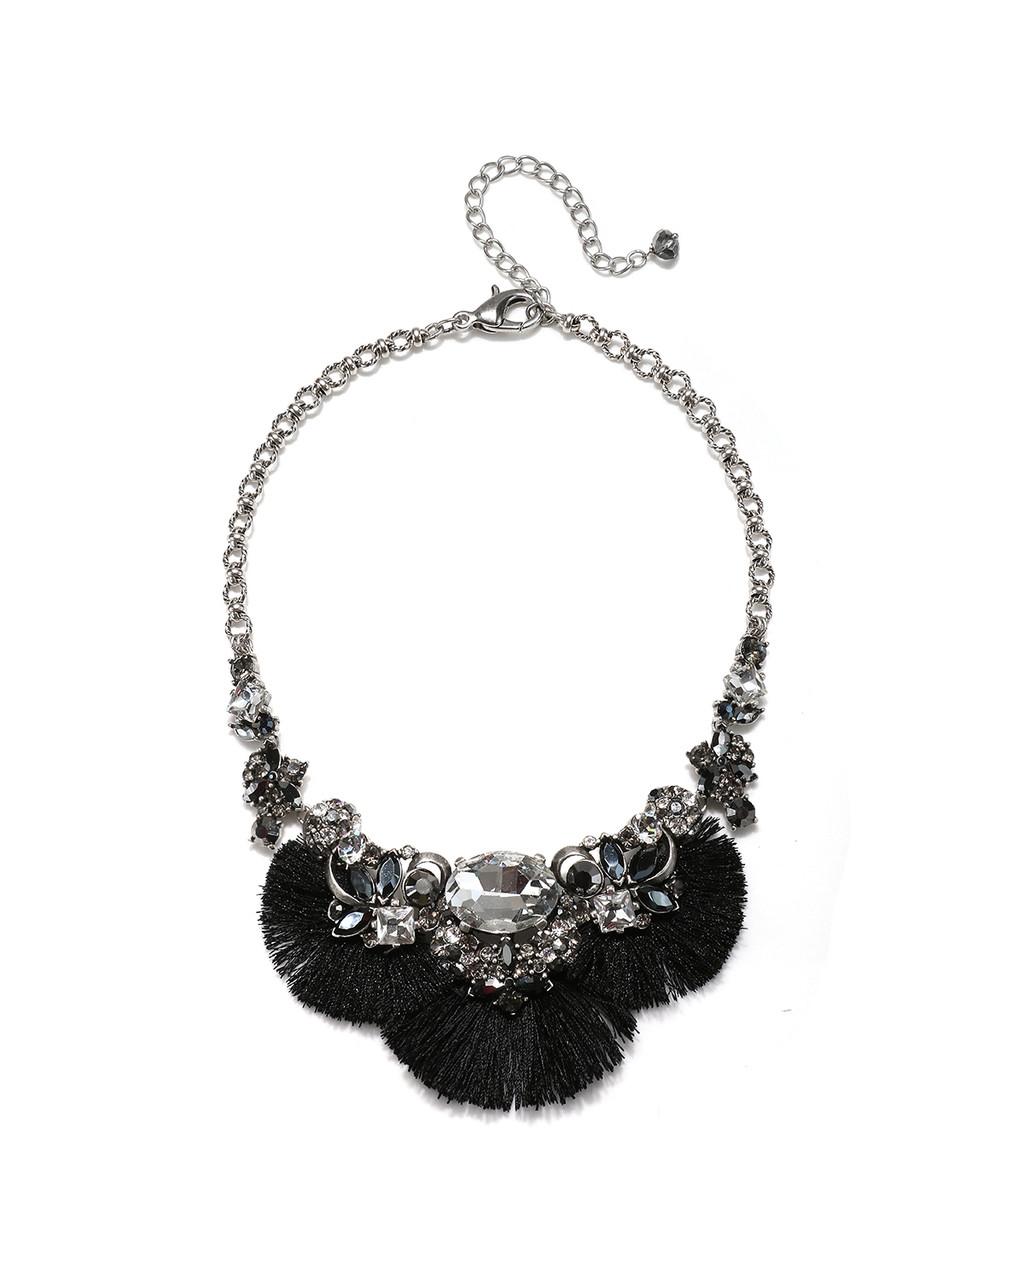 4a7ed756f0df4 Black Tassel & Stone Silver Necklace